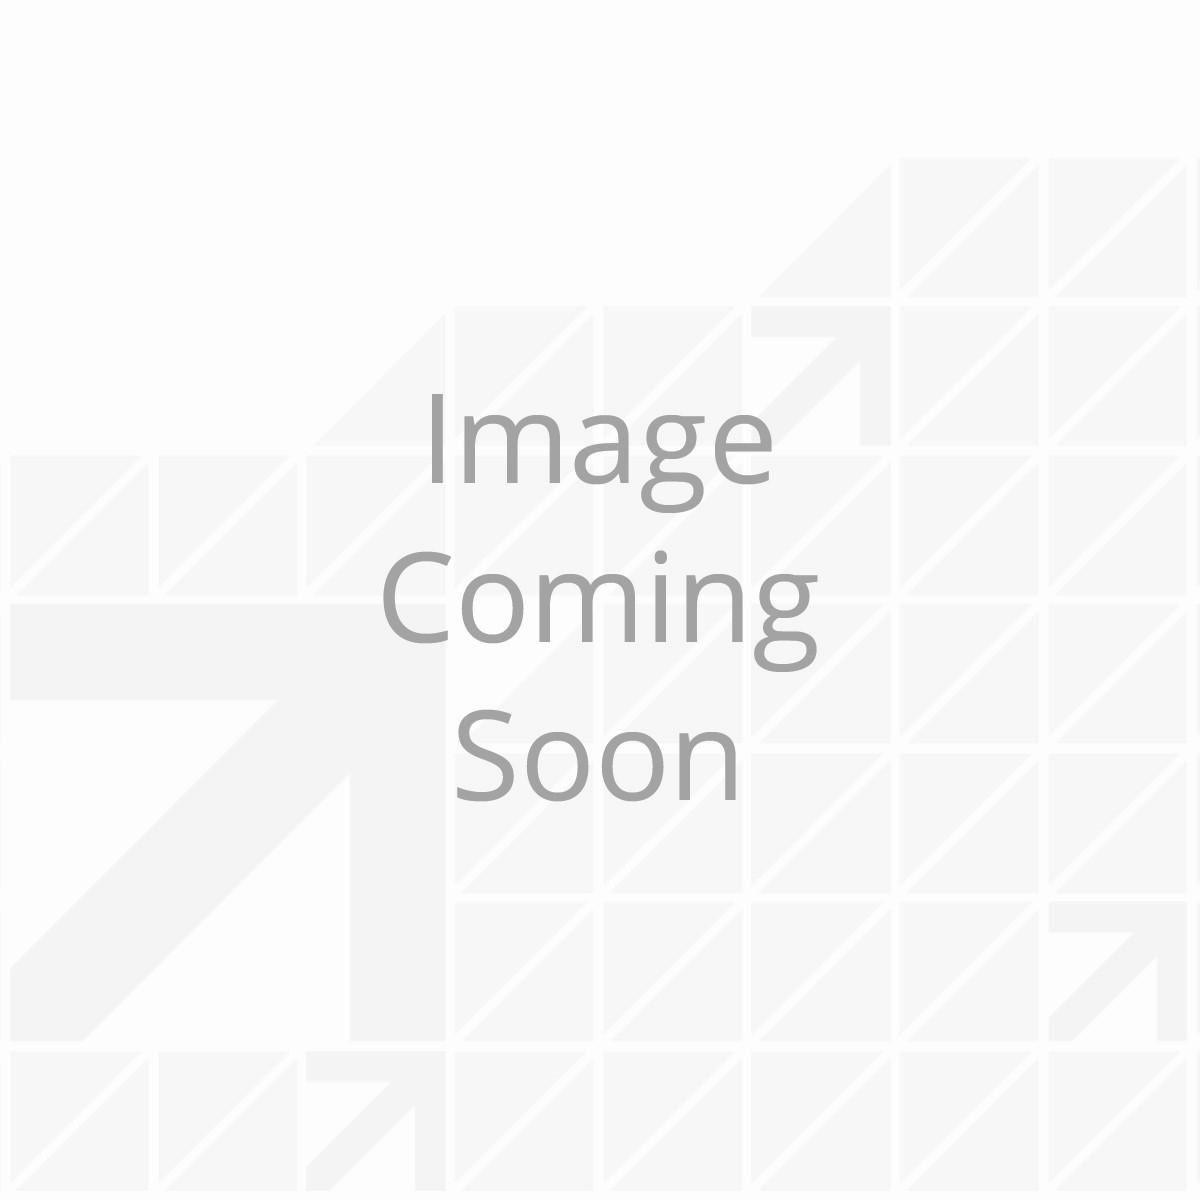 30A LED Cordset - 12' (Yellow)